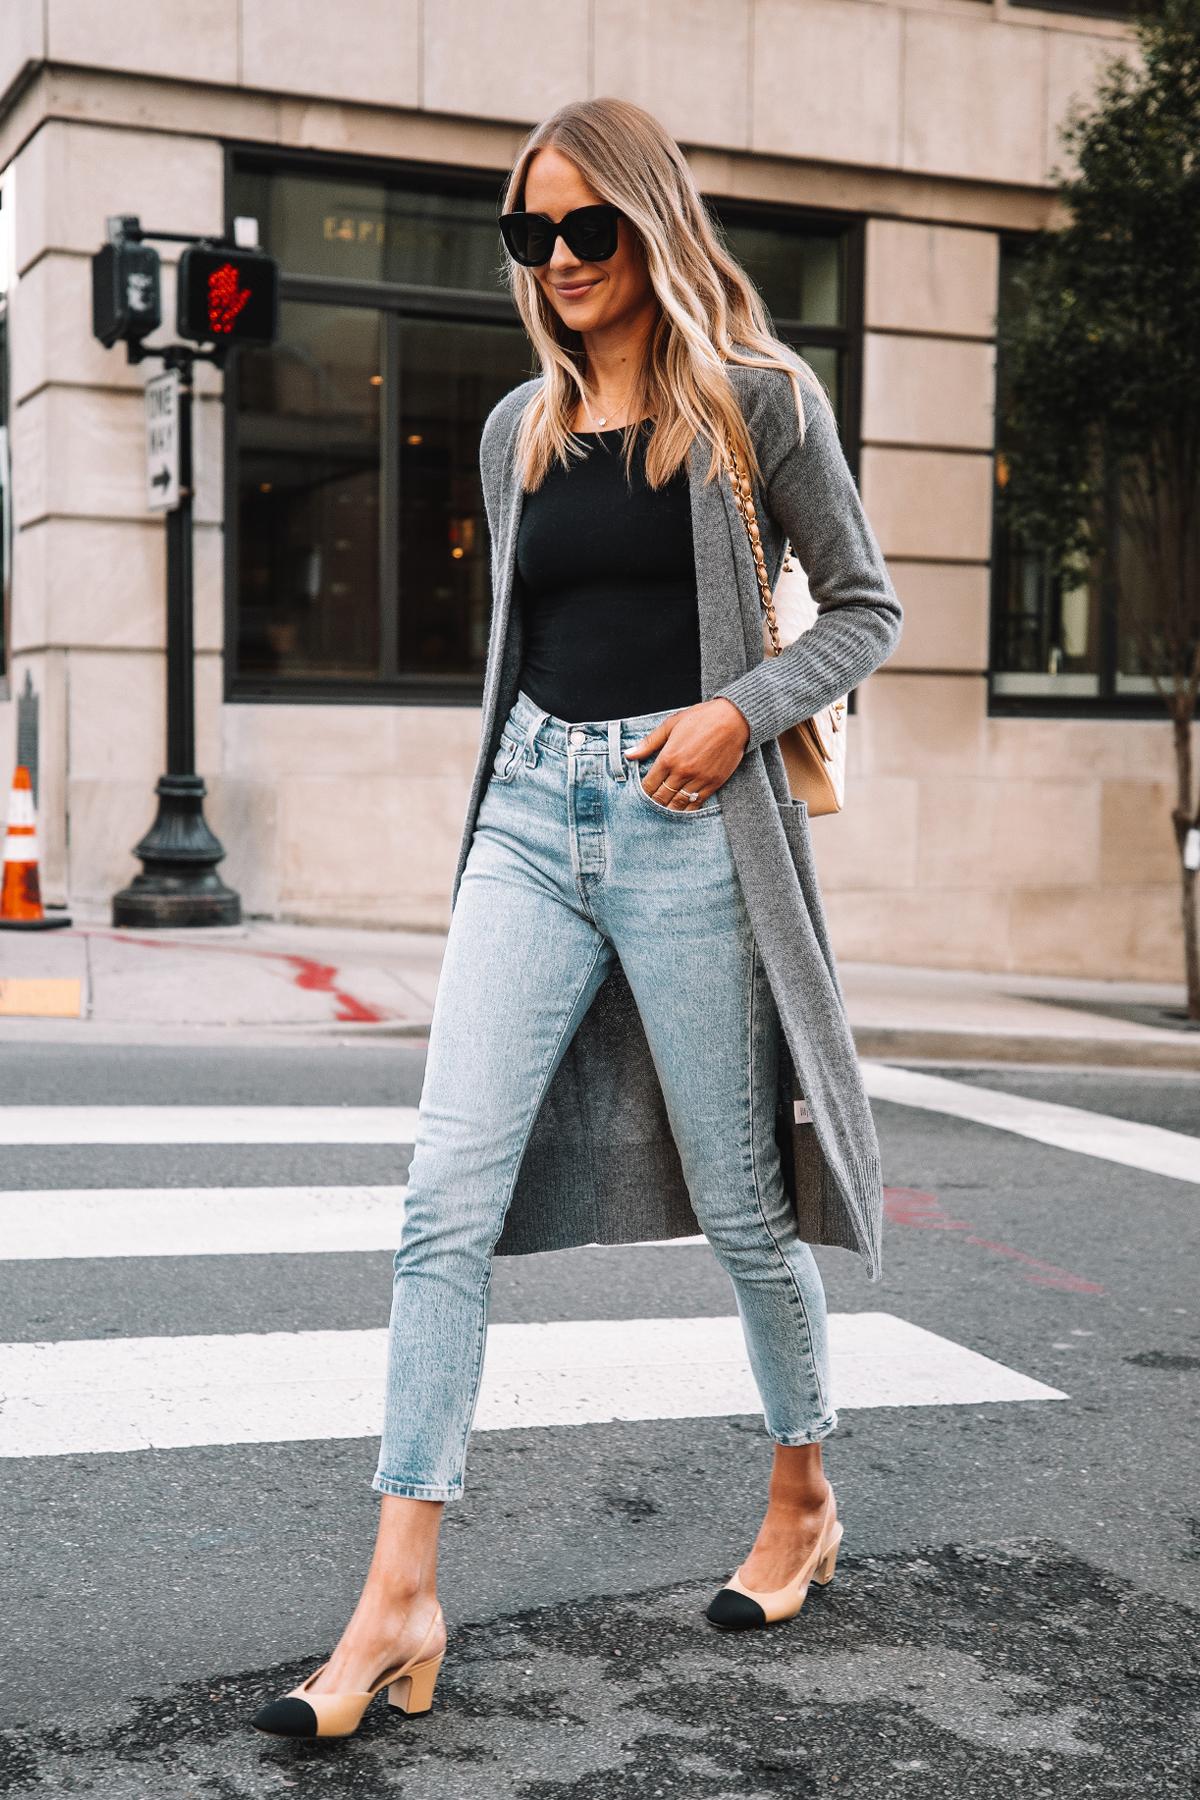 Fashion Jackson Wearing Long Grey Cardigan Black Bodysuit Levis 501 Jeans Chanel Slingbacks 1